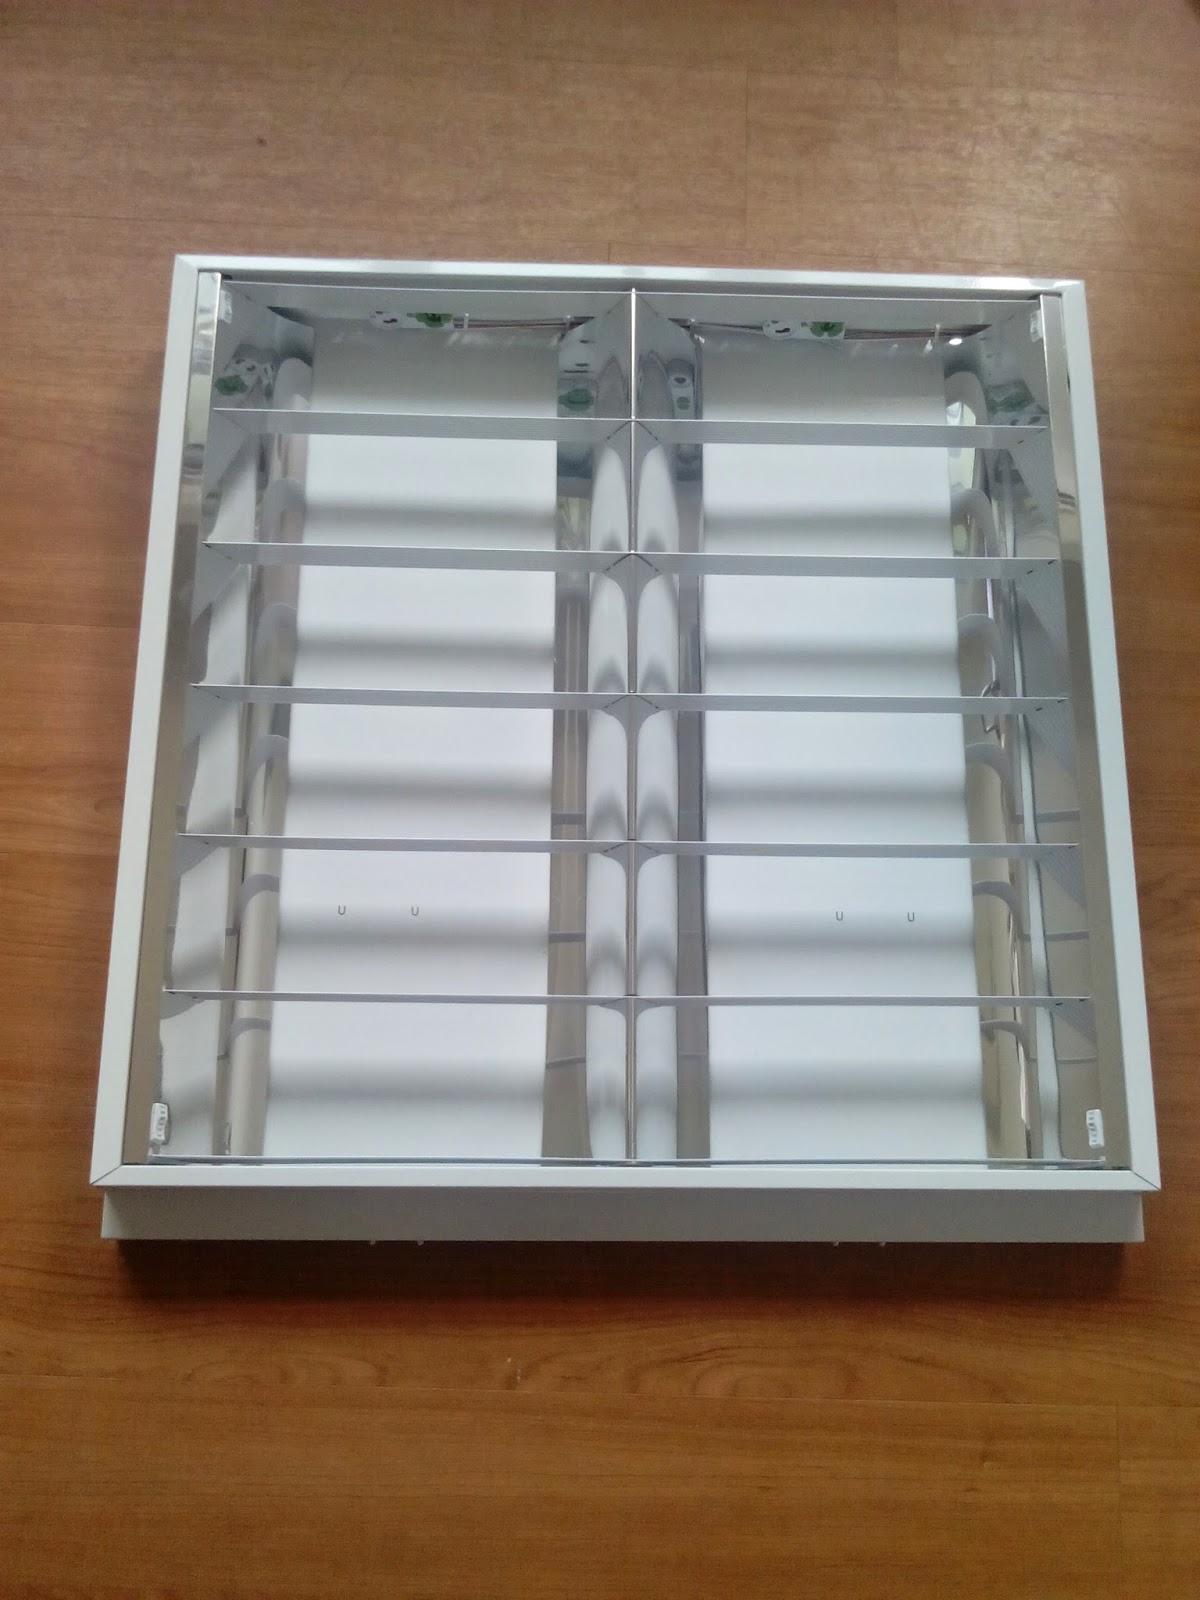 LED Lighting Singapore LED Strips Bulbs Downlights 2 By 2 Feet T8 LED F